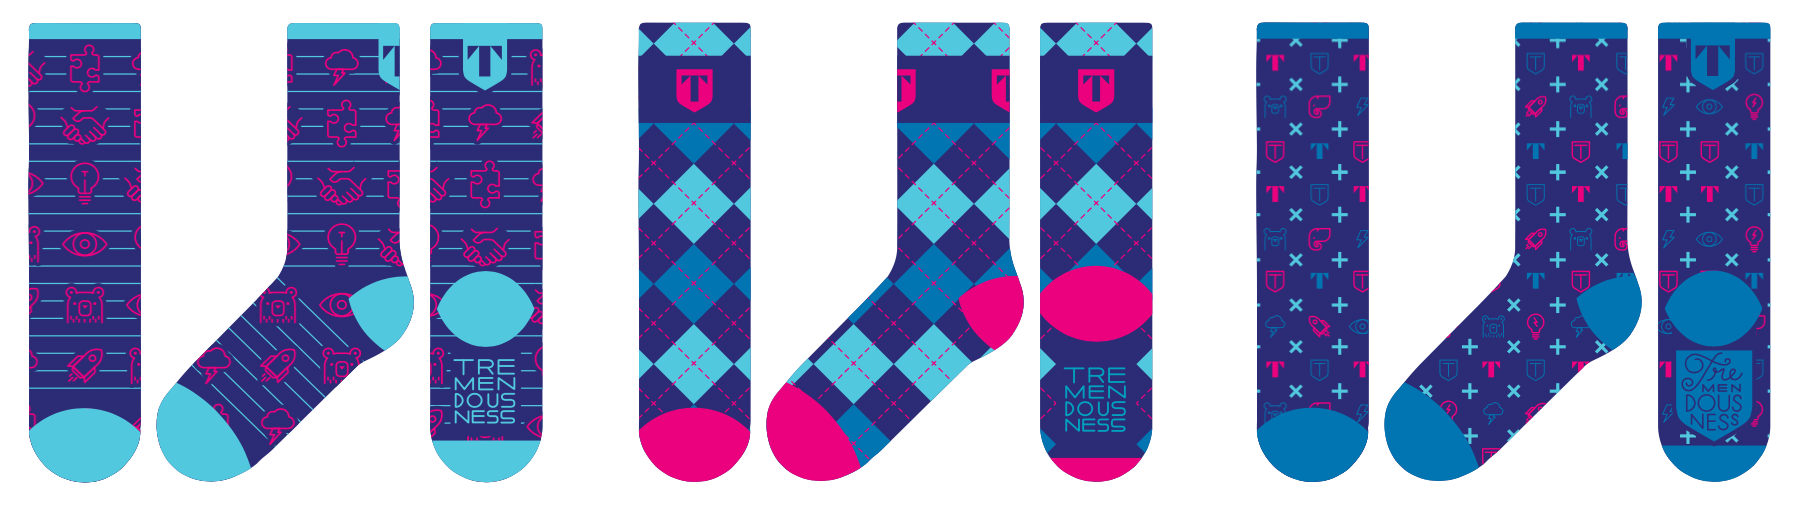 socks graphics